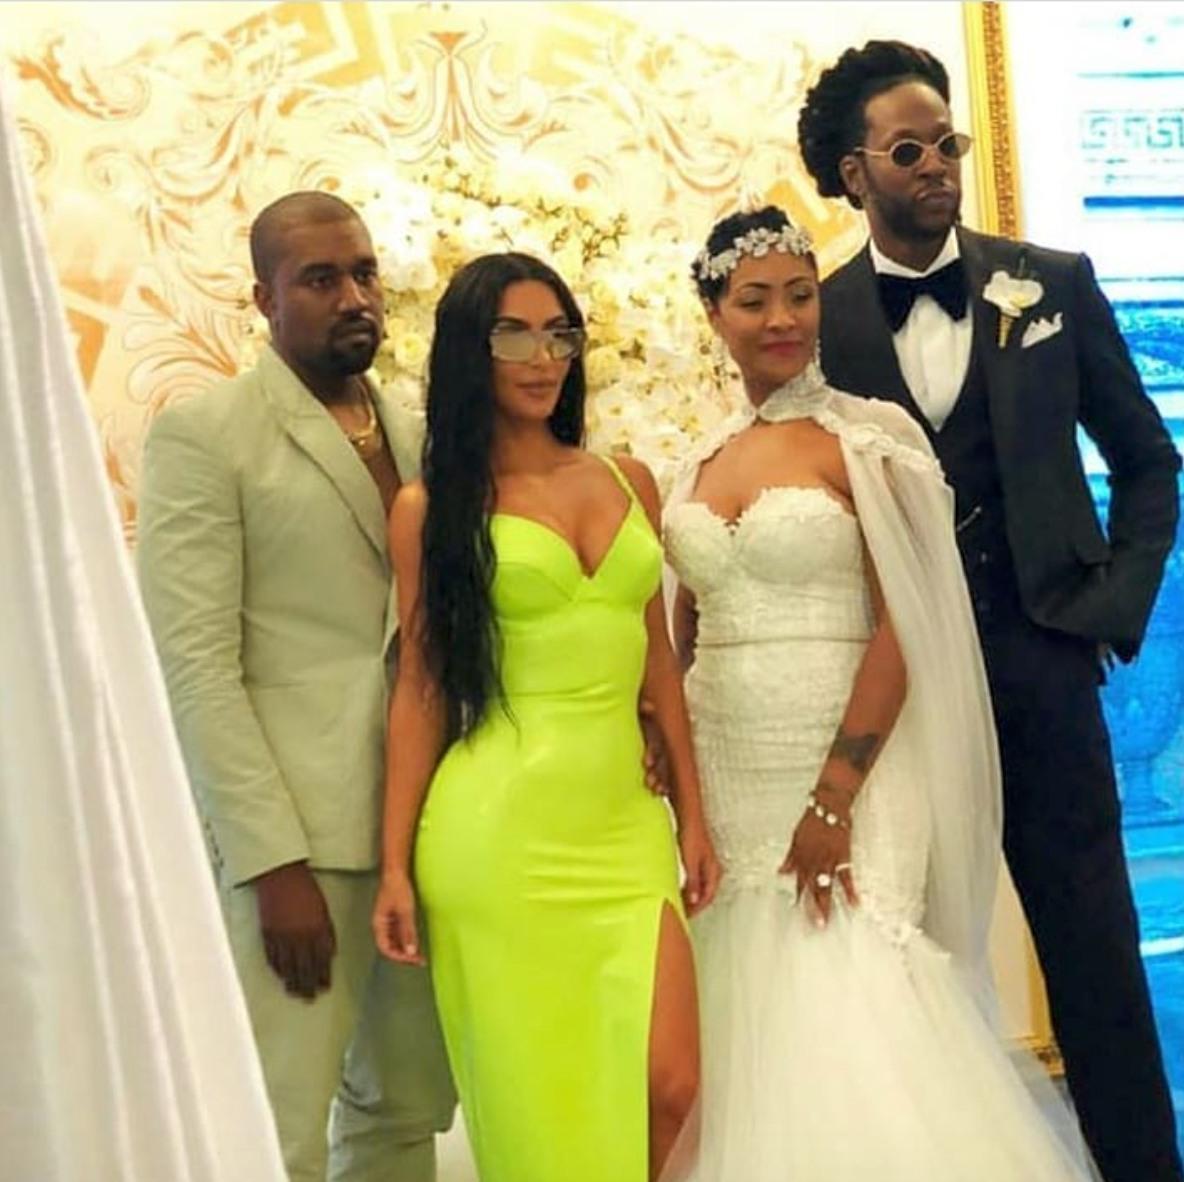 2 Chainz Marries Longtime Girlfriend Kesha In Miami Photos 4